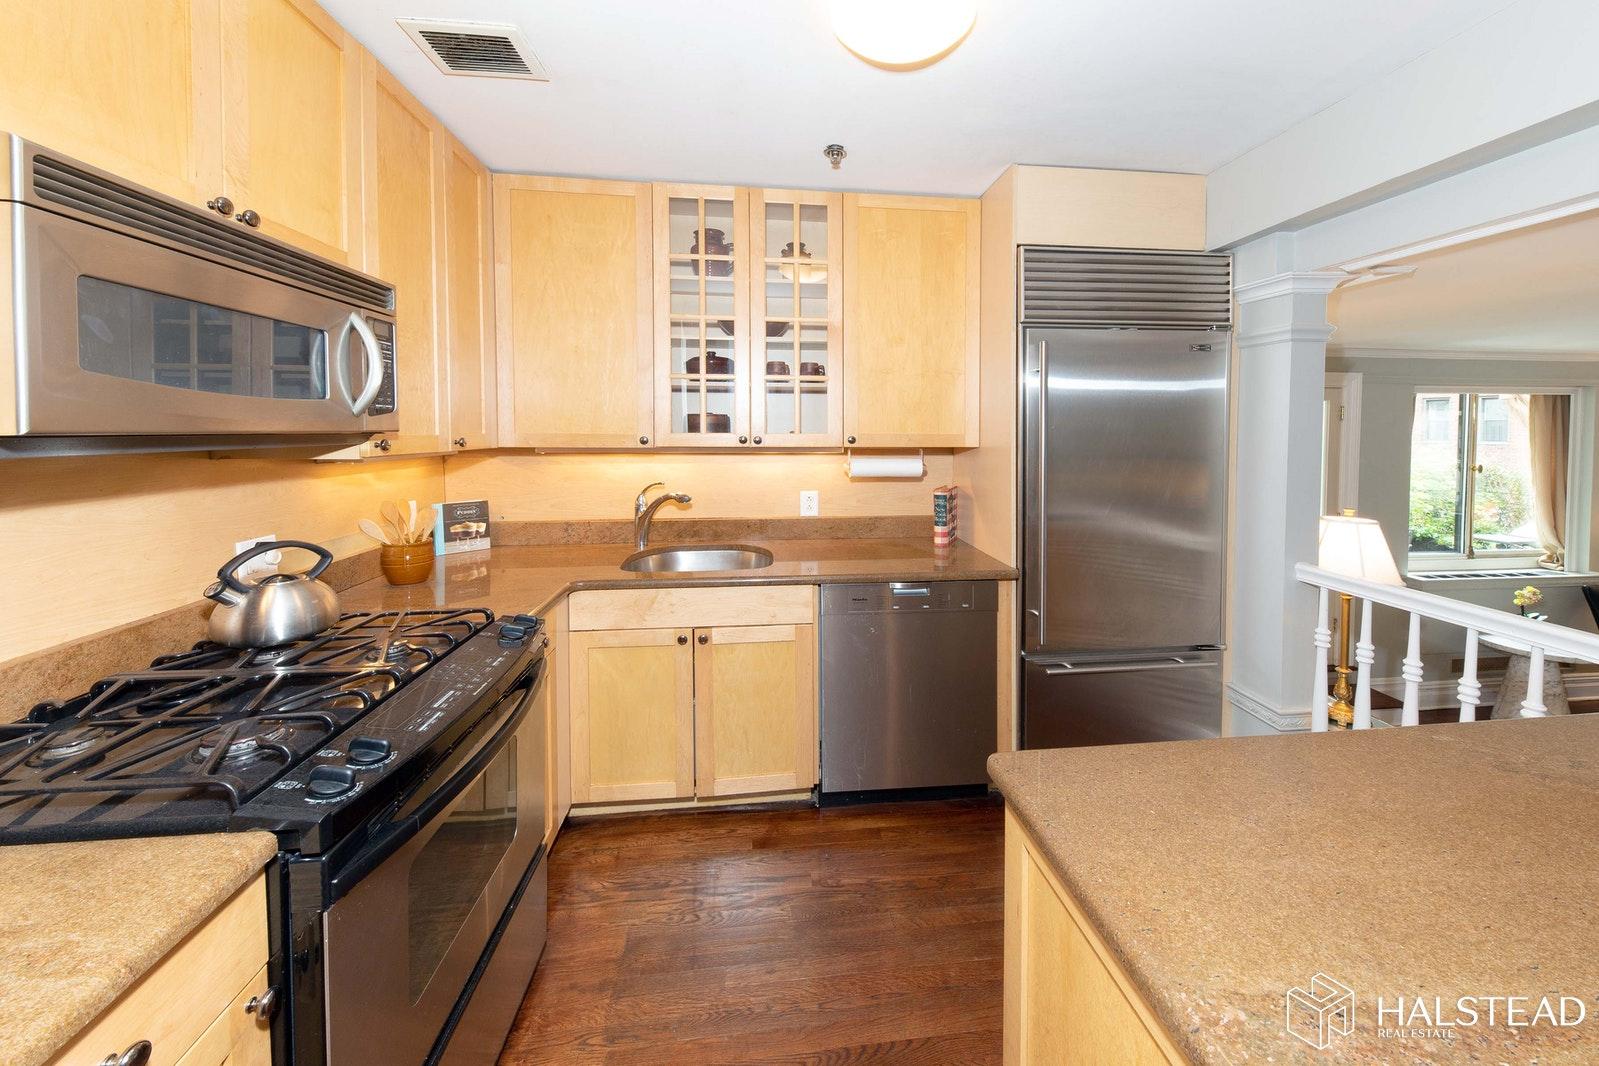 203 WEST 90TH STREET 7B, Upper West Side, $2,500,000, Web #: 20274335